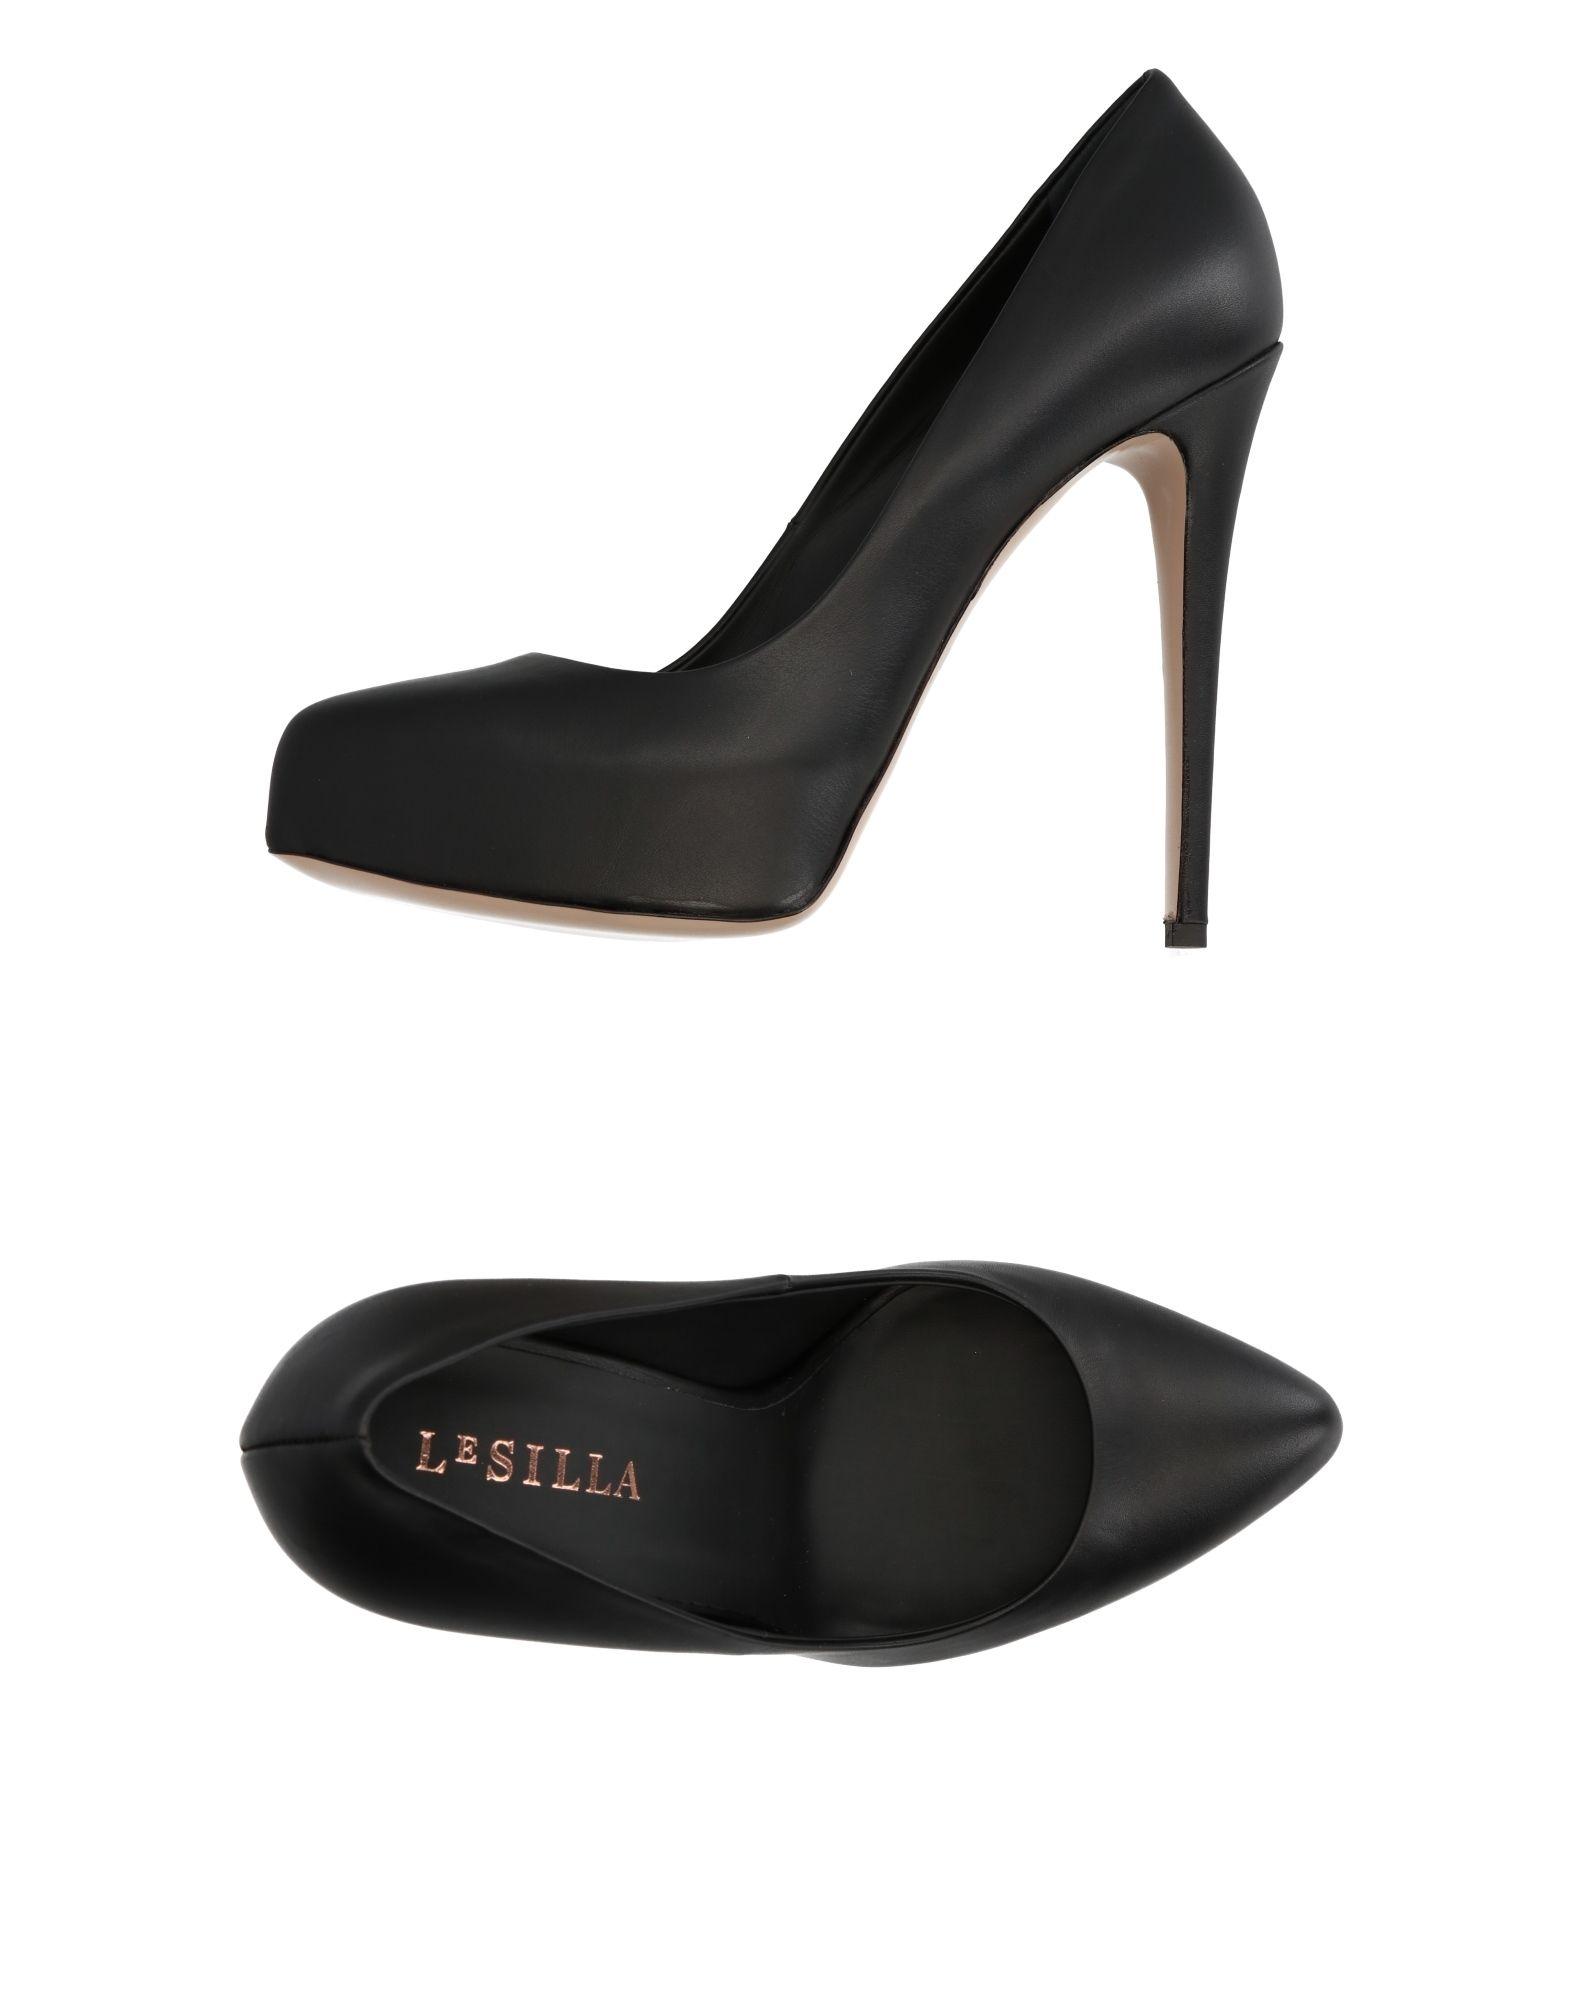 Rabatt Schuhe  Le Silla Pumps Damen  Schuhe 11287378NR c9253f